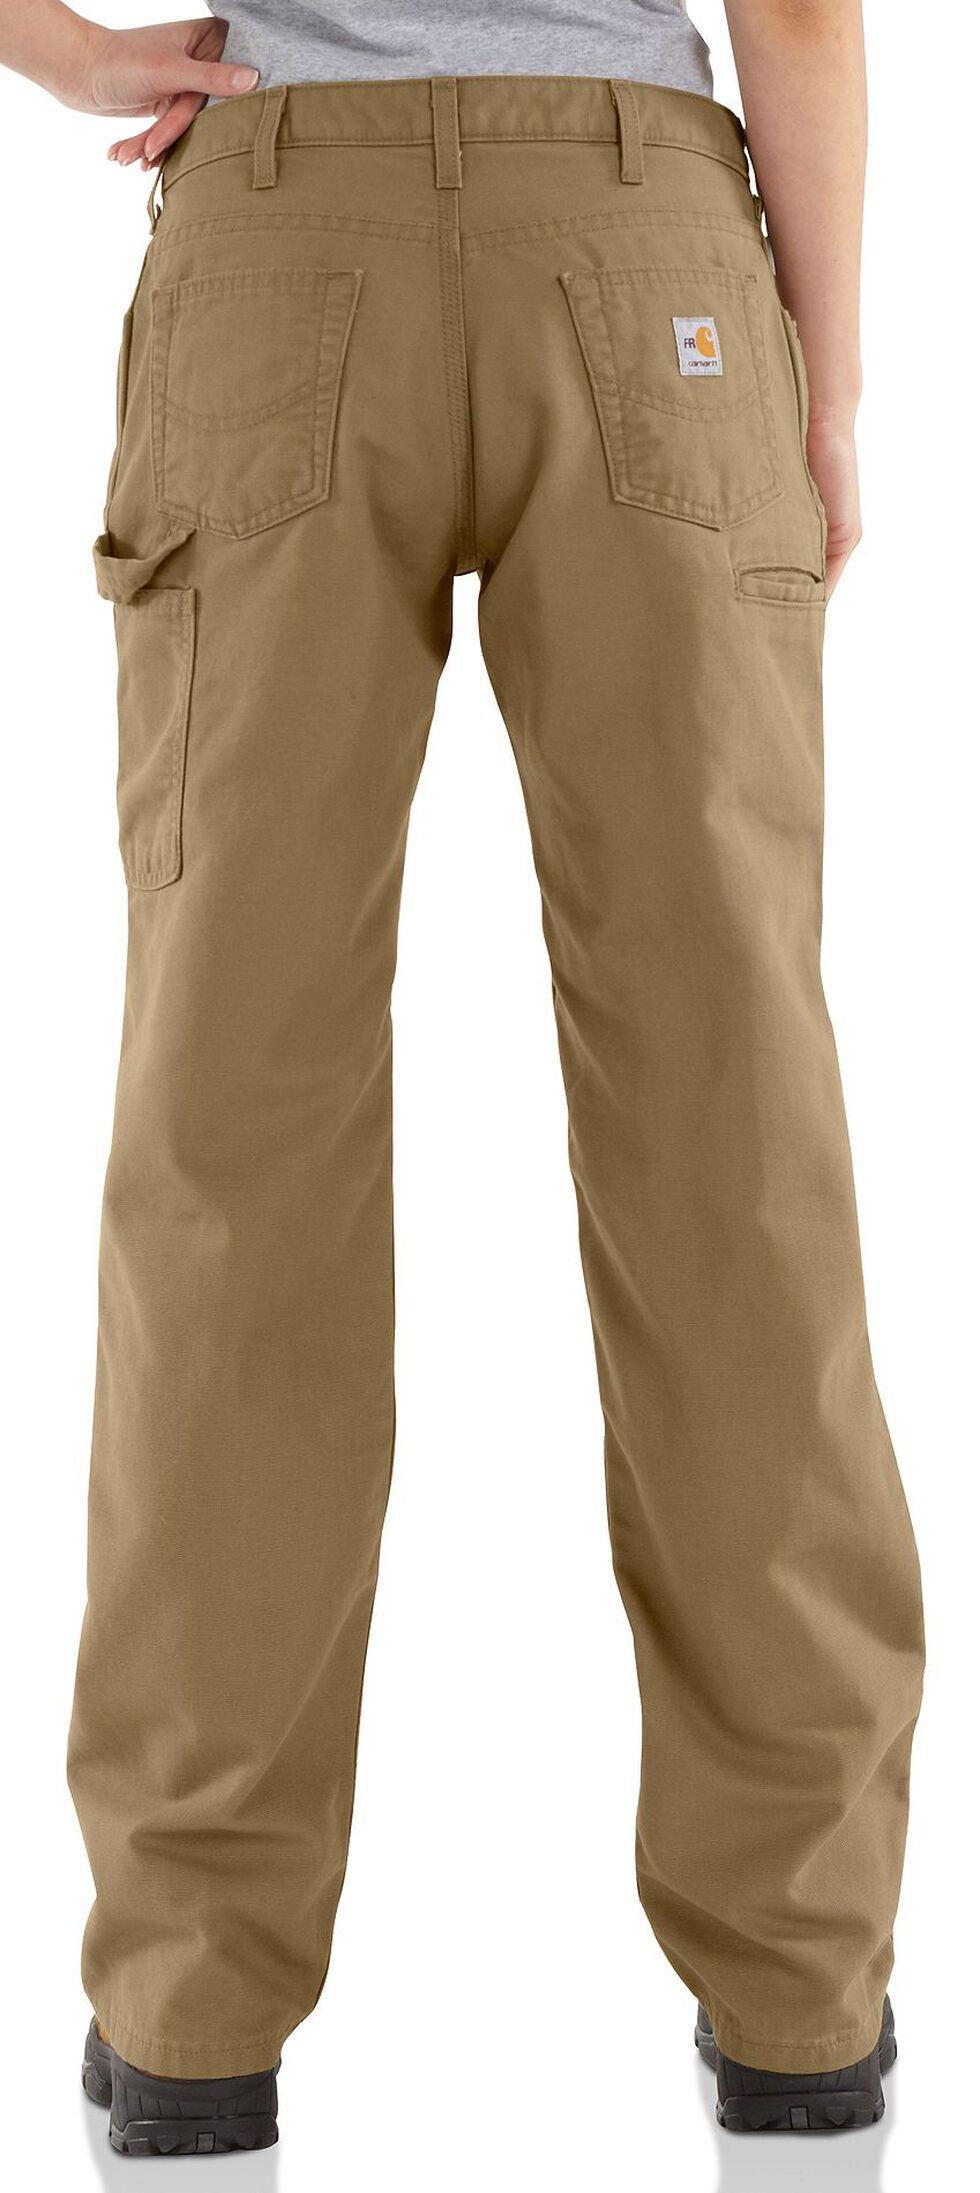 "Carhartt Flame Resistant Canvas Work Pants - 32"" Inseam, Khaki, hi-res"